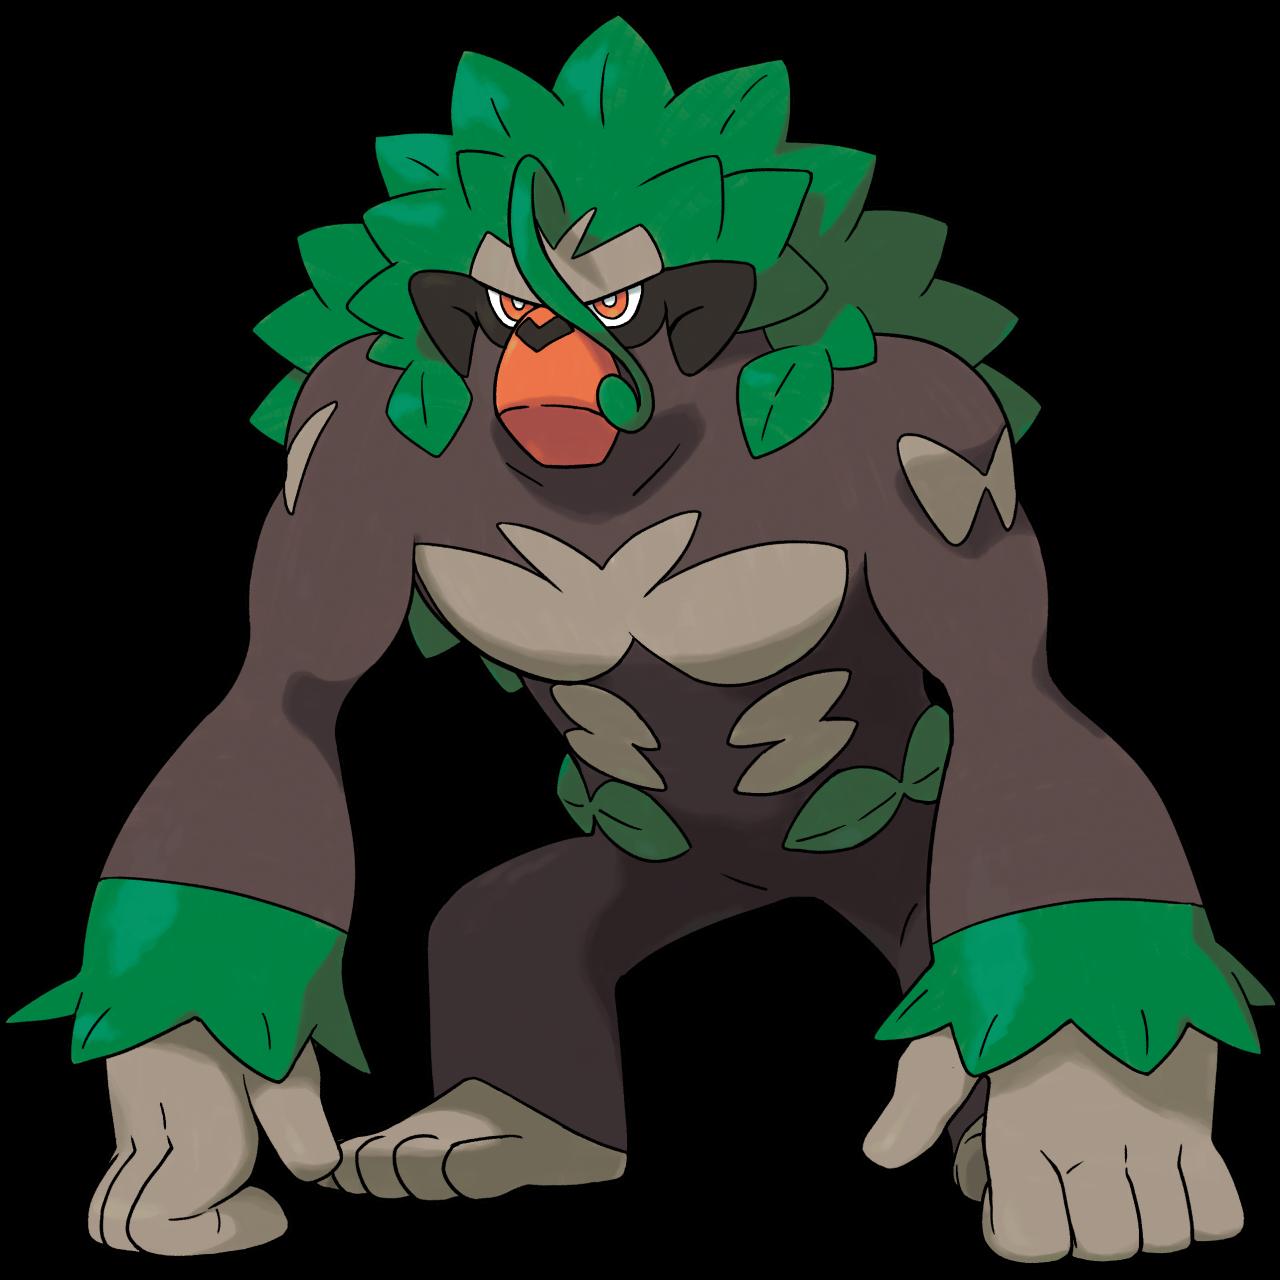 Rillaboom (Pokémon)